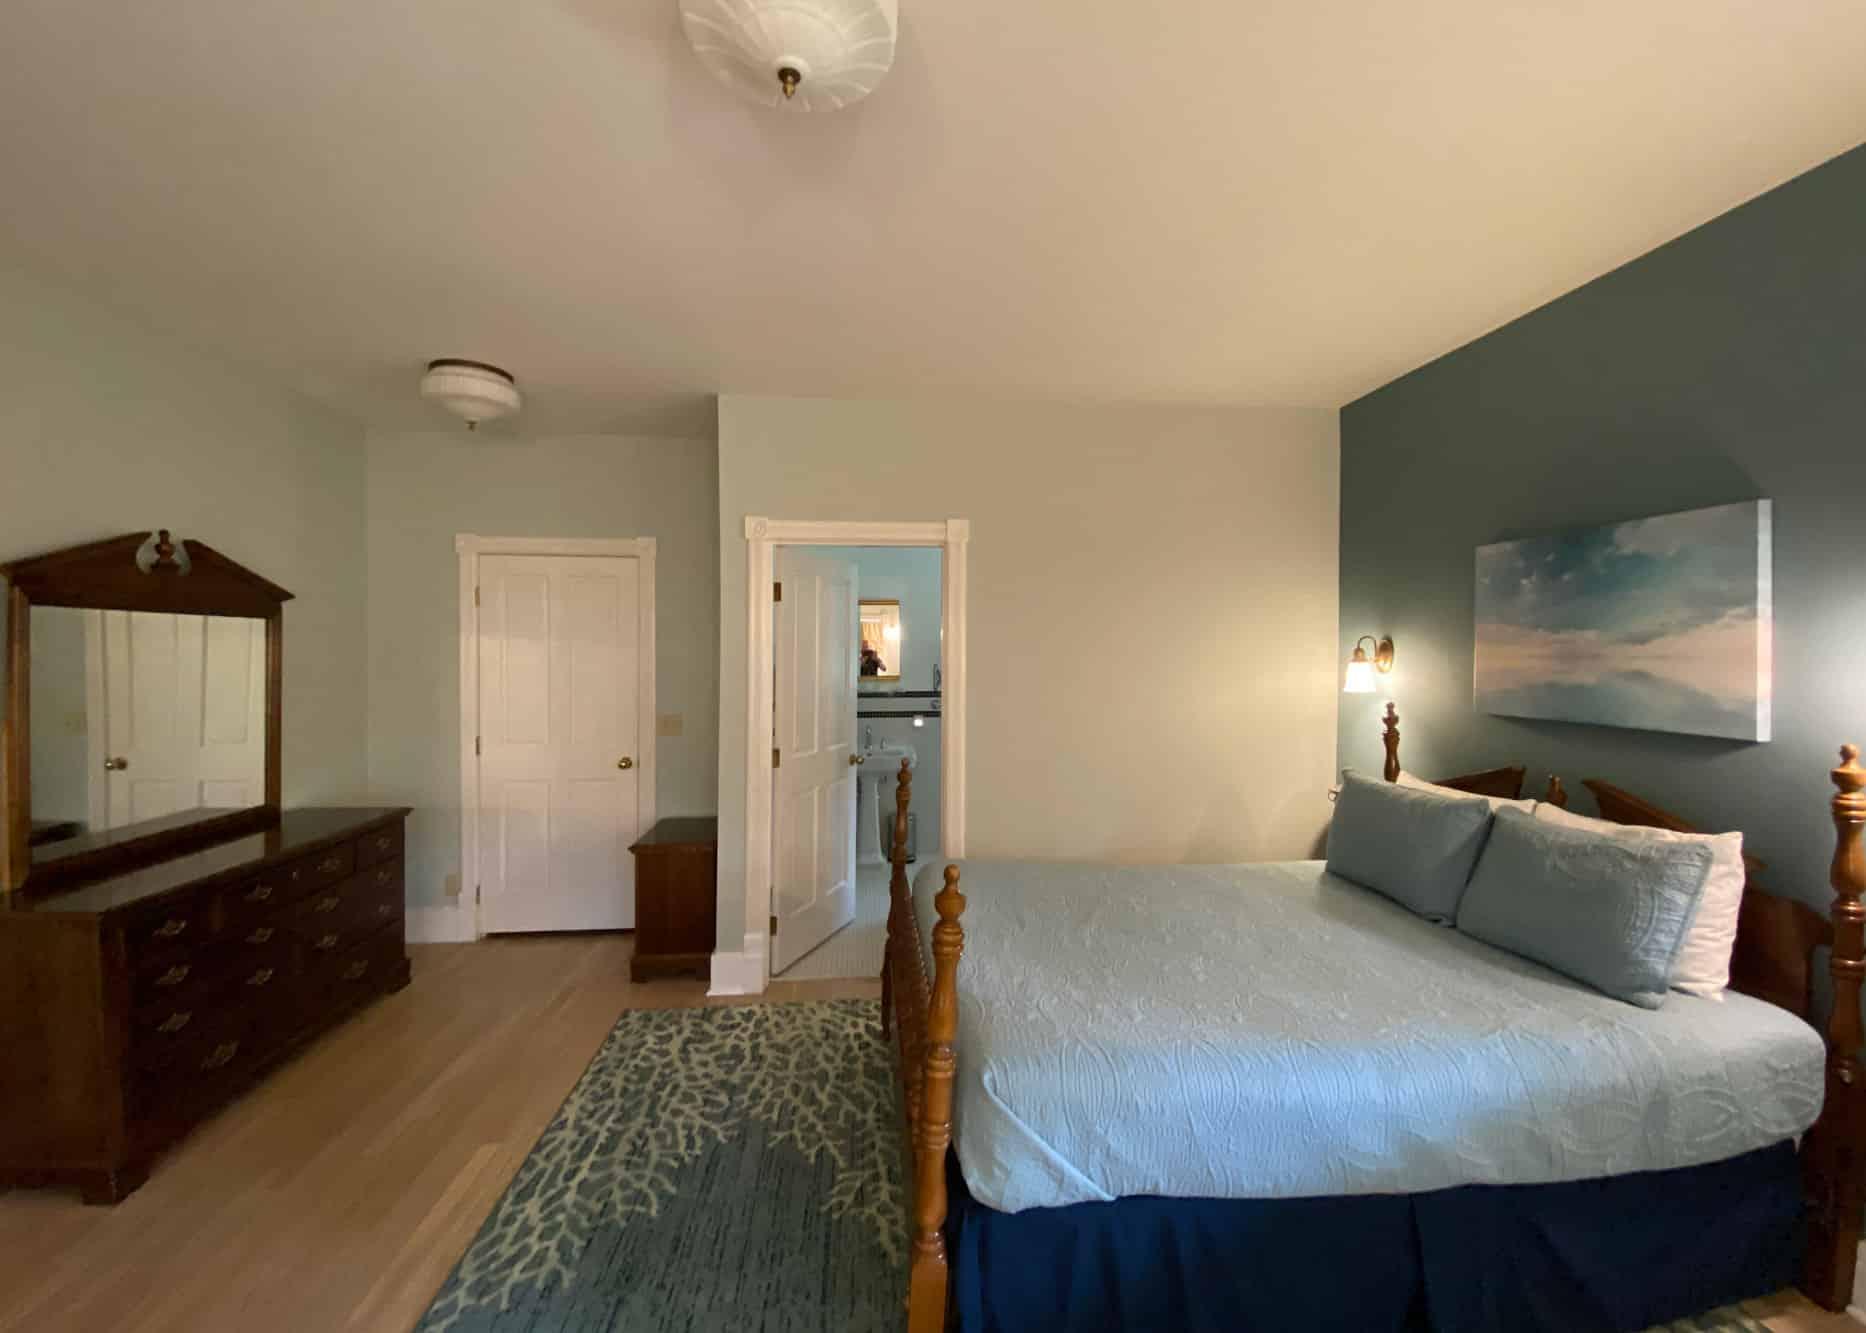 the-edenwild-inn-lopez-island-lodging-2020-room-01-02